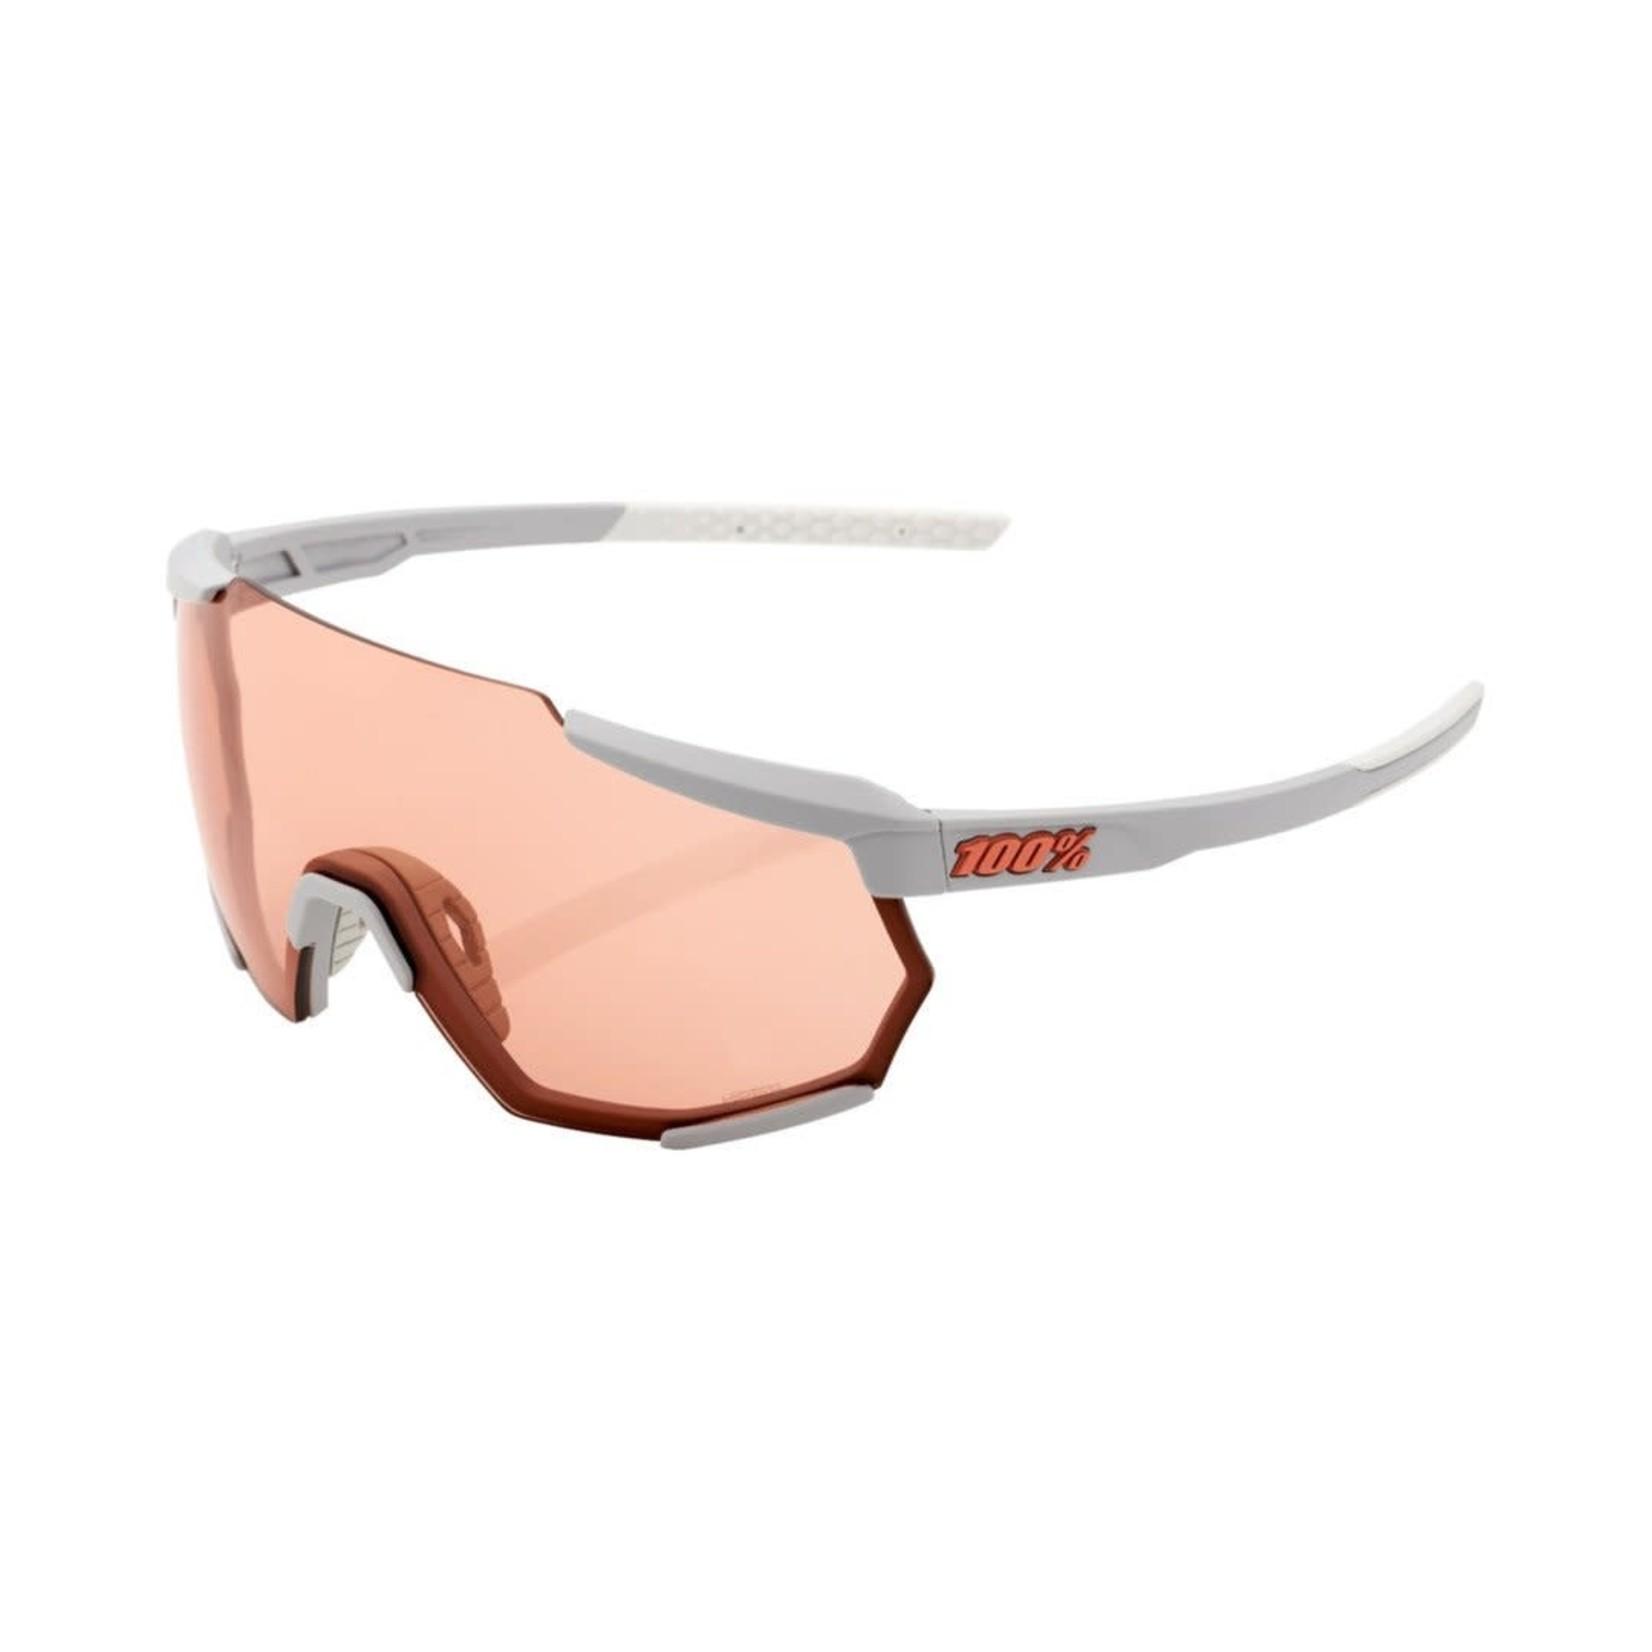 100% 100% - Occhiali Racetrap